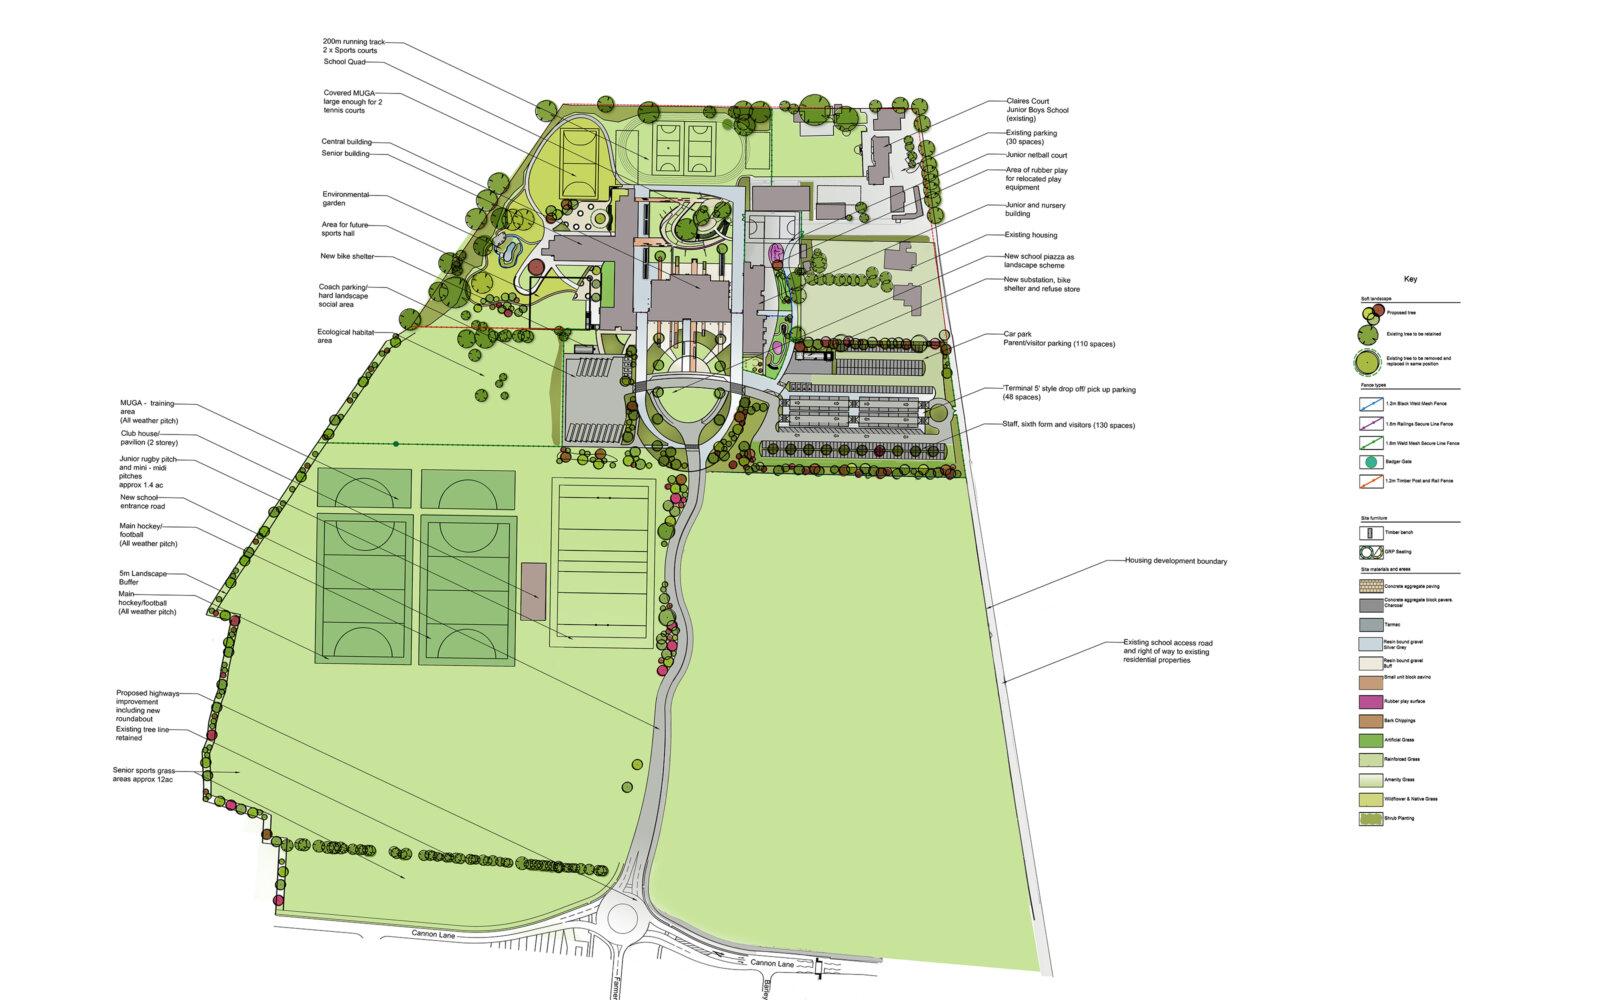 Claires Court School site layout